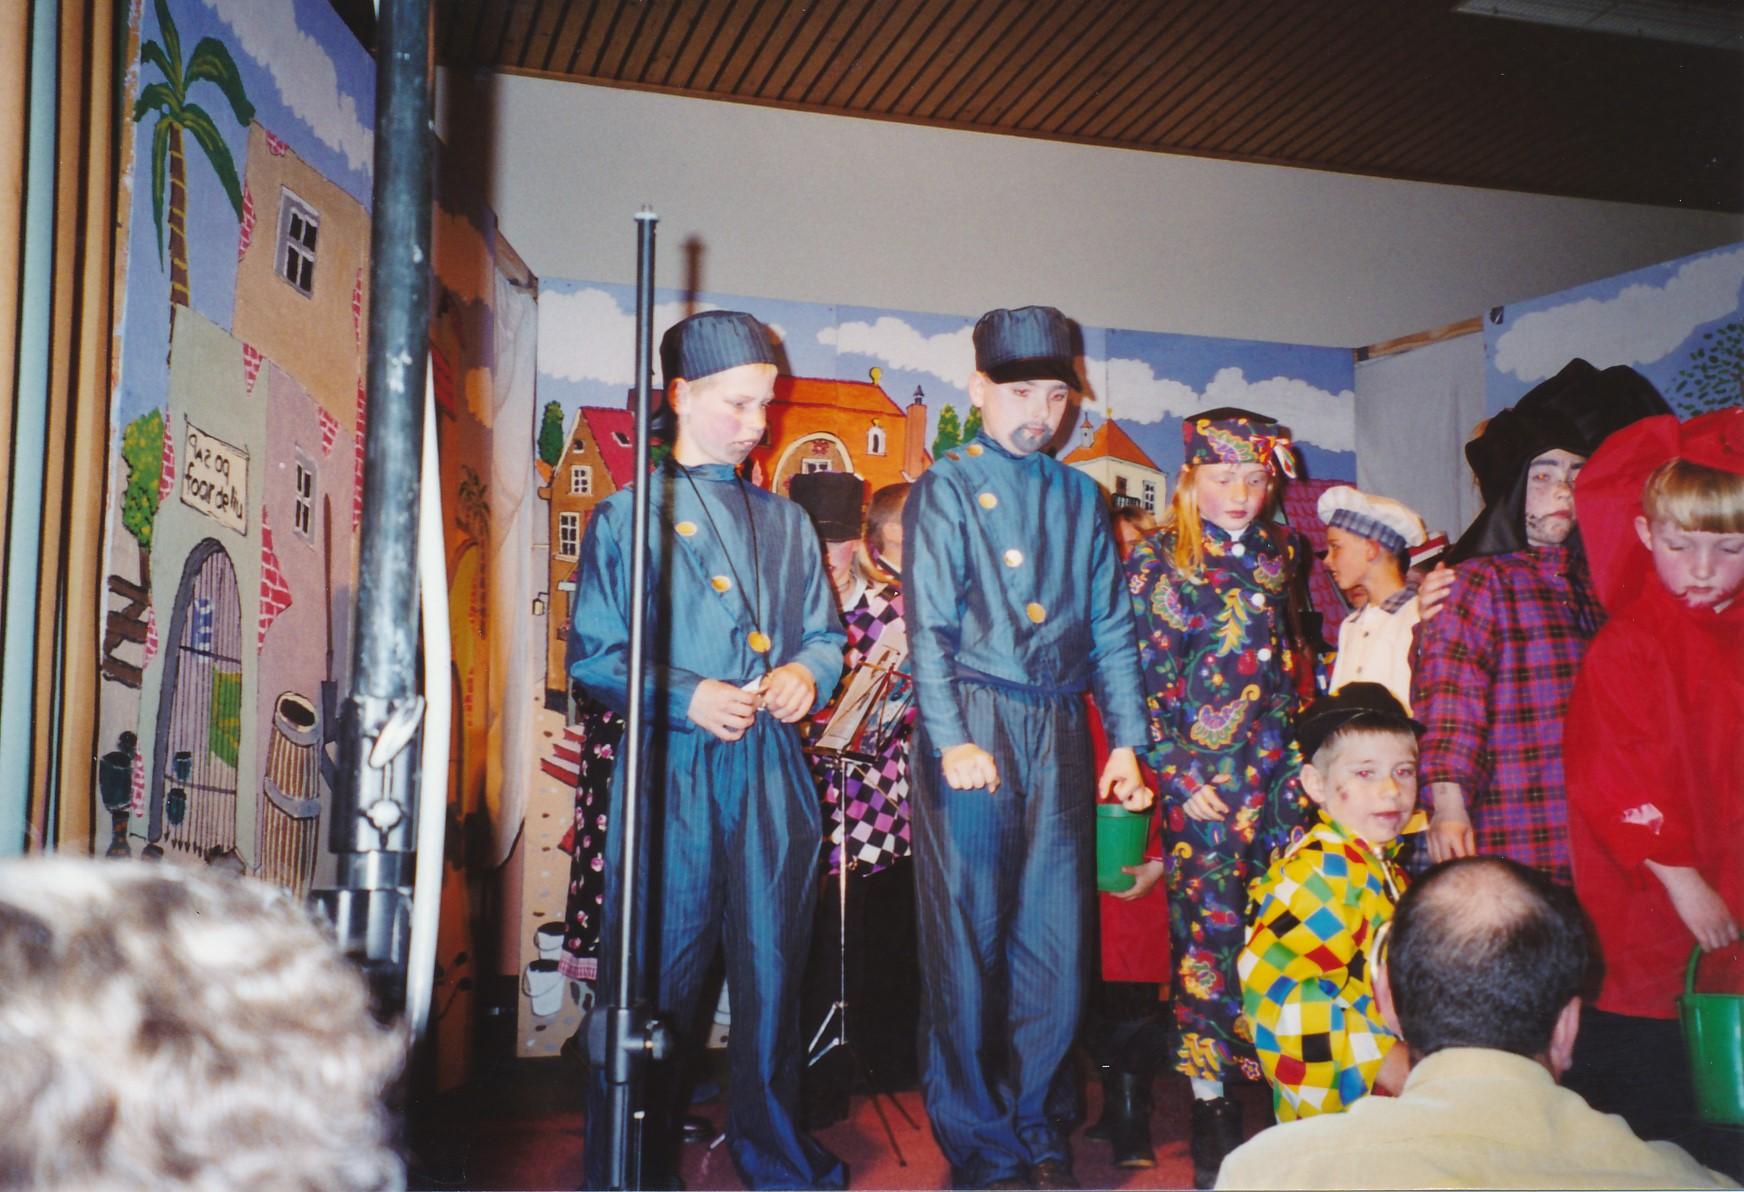 Fotoalbum Anneke Miedema, 111, Musical 2005, u.o. Menno Douma, Jelmer Melein, Sasia Abbing, Thedo van der Wal en Sytse Nauta